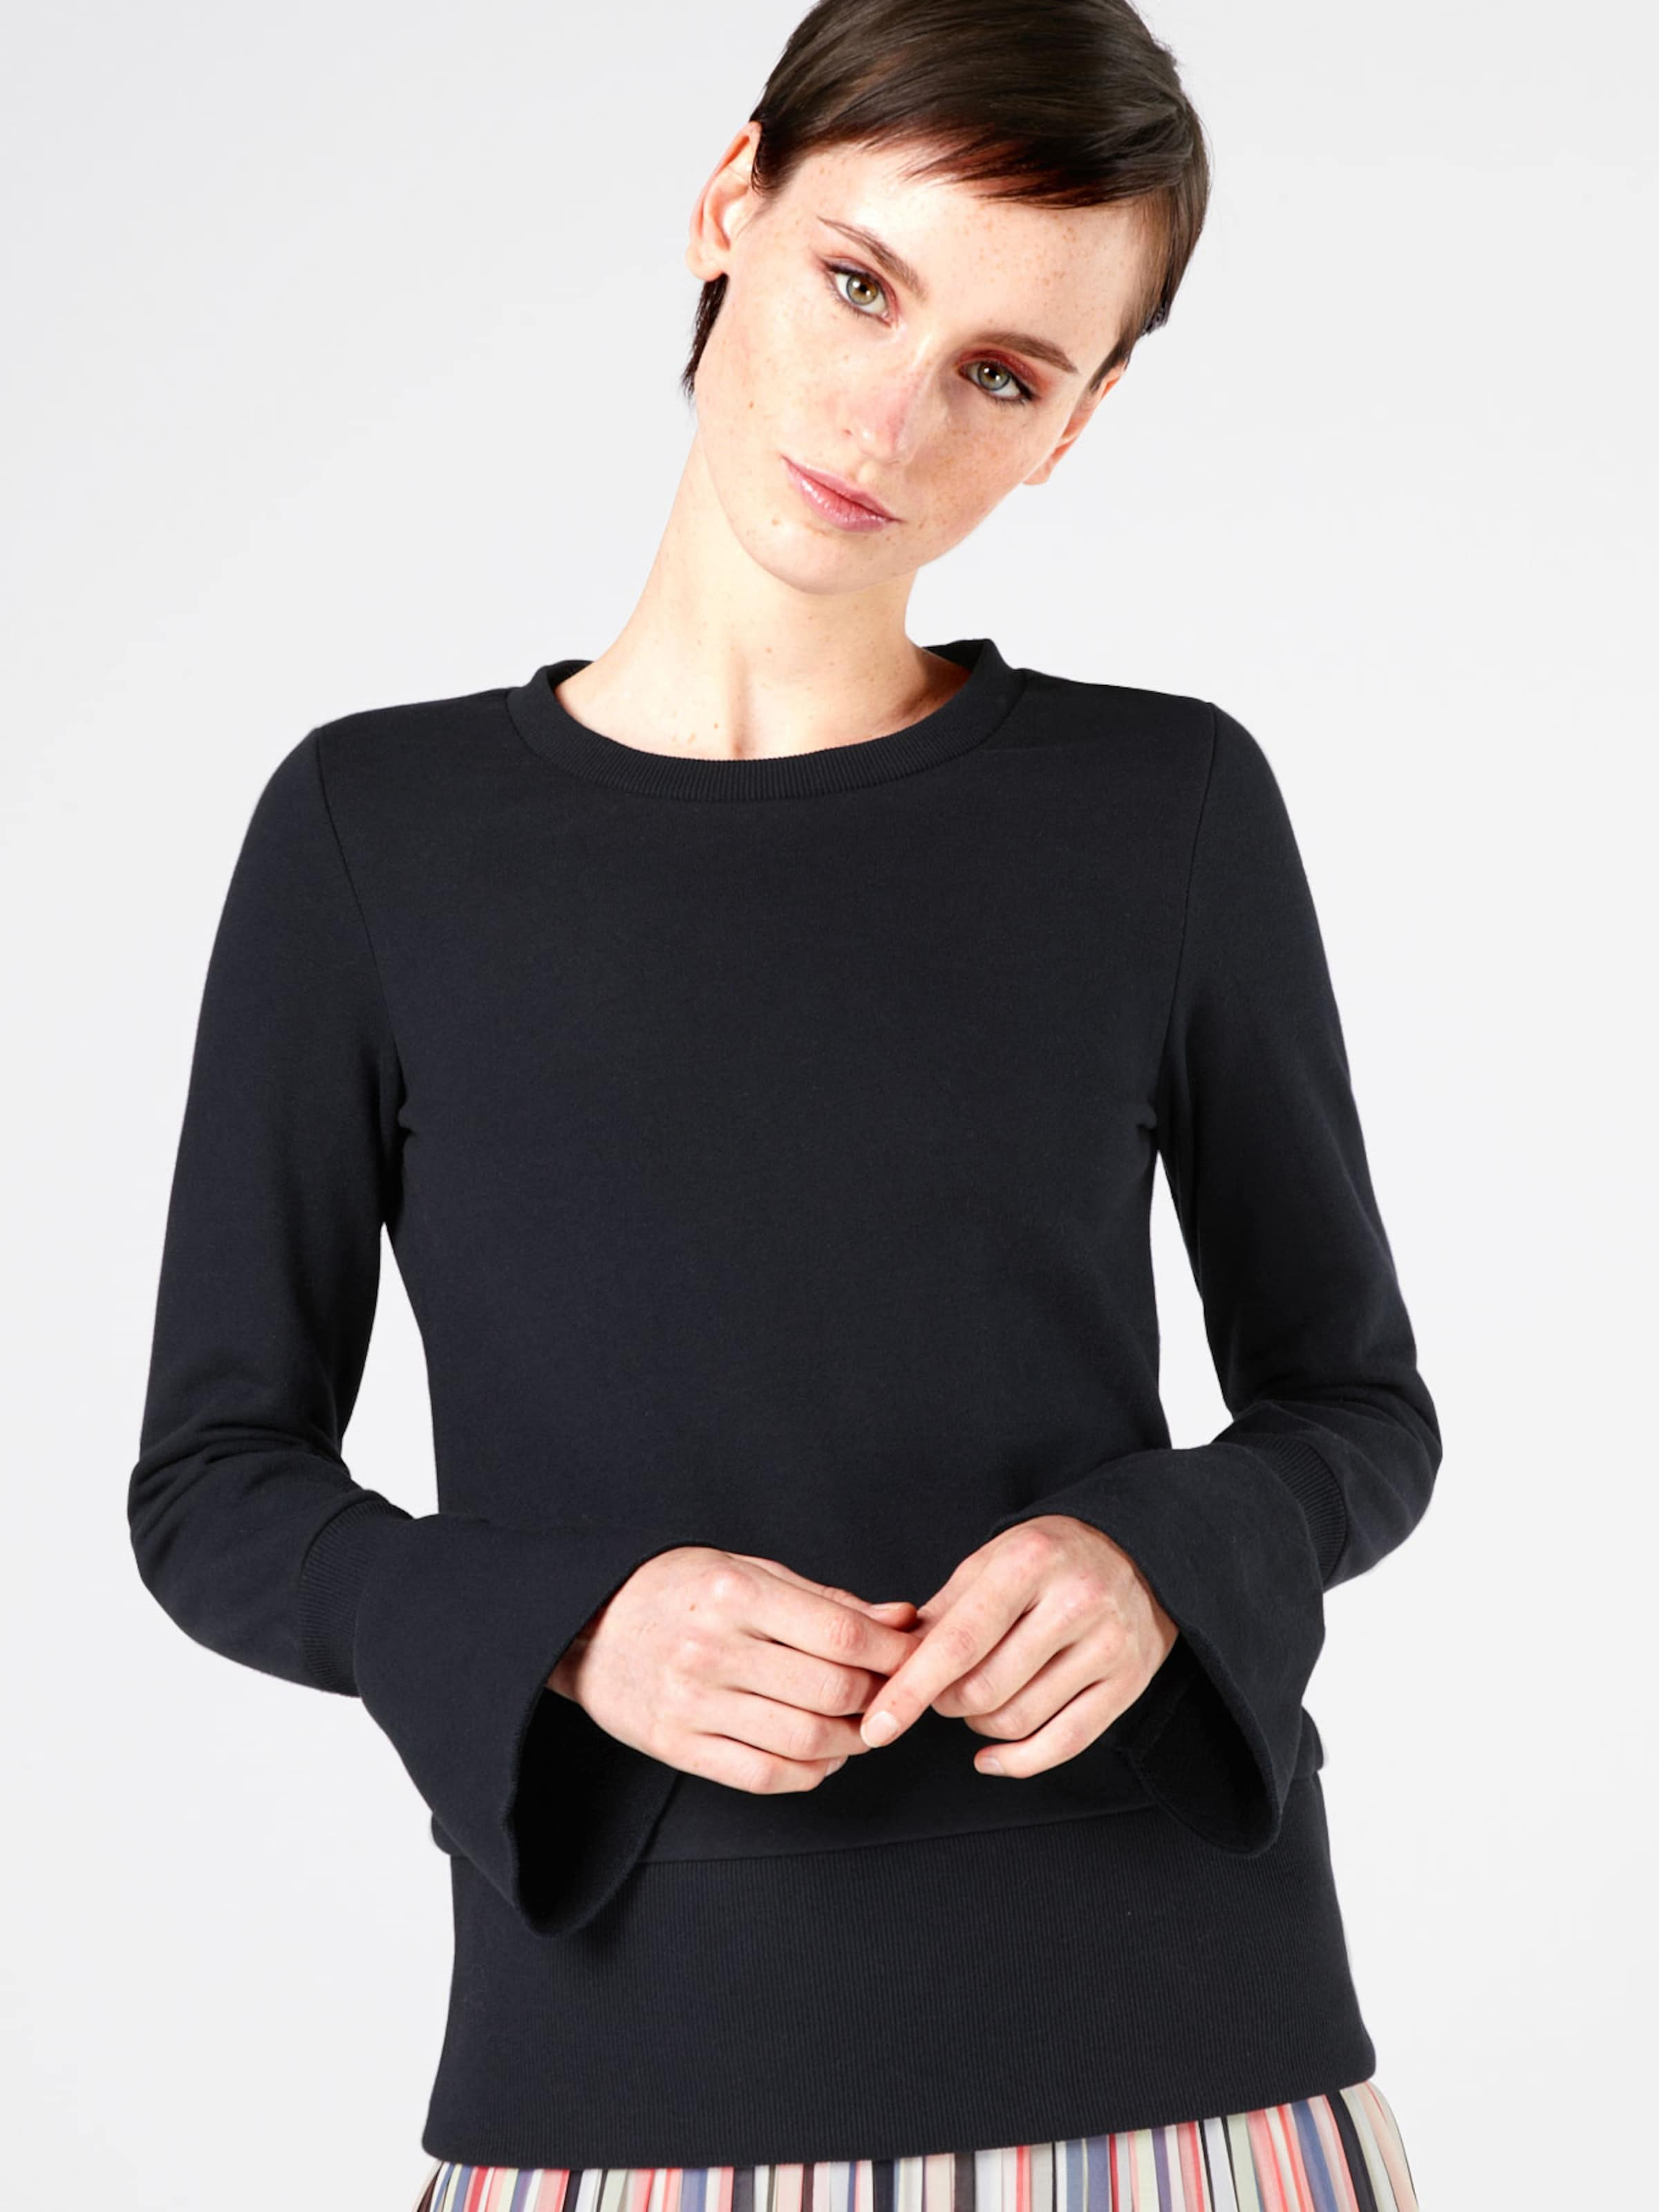 VILA Pullover 'MISTA' Preise Rabatt Großhandel Günstig Kaufen Eastbay nubFXVoI